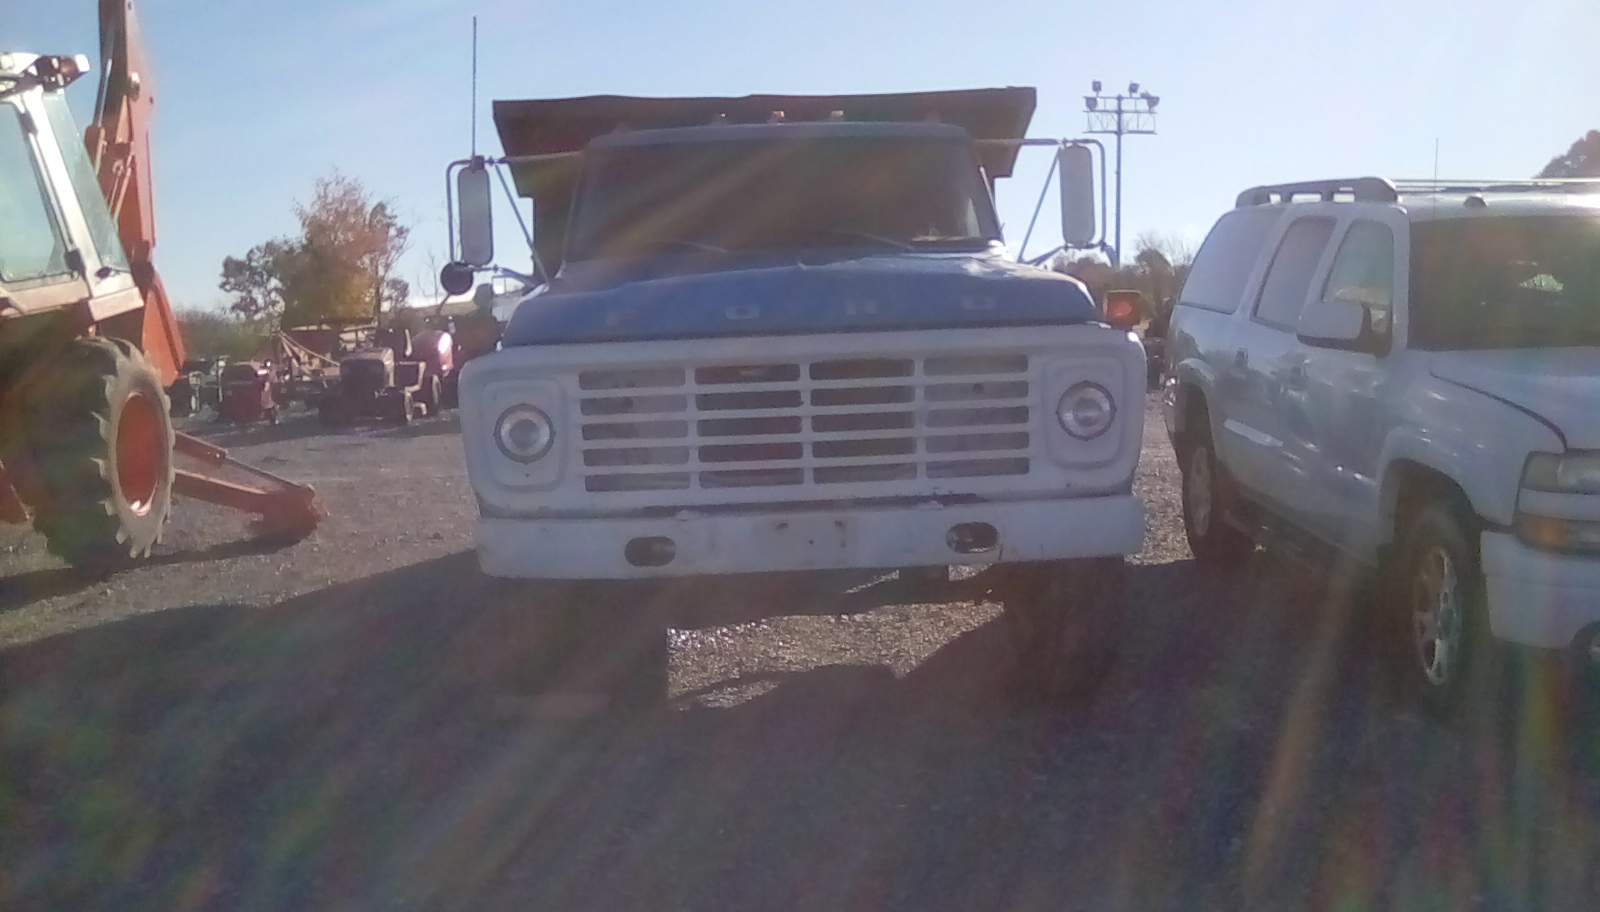 1976 FORD F700 DUMP TRUCK Image